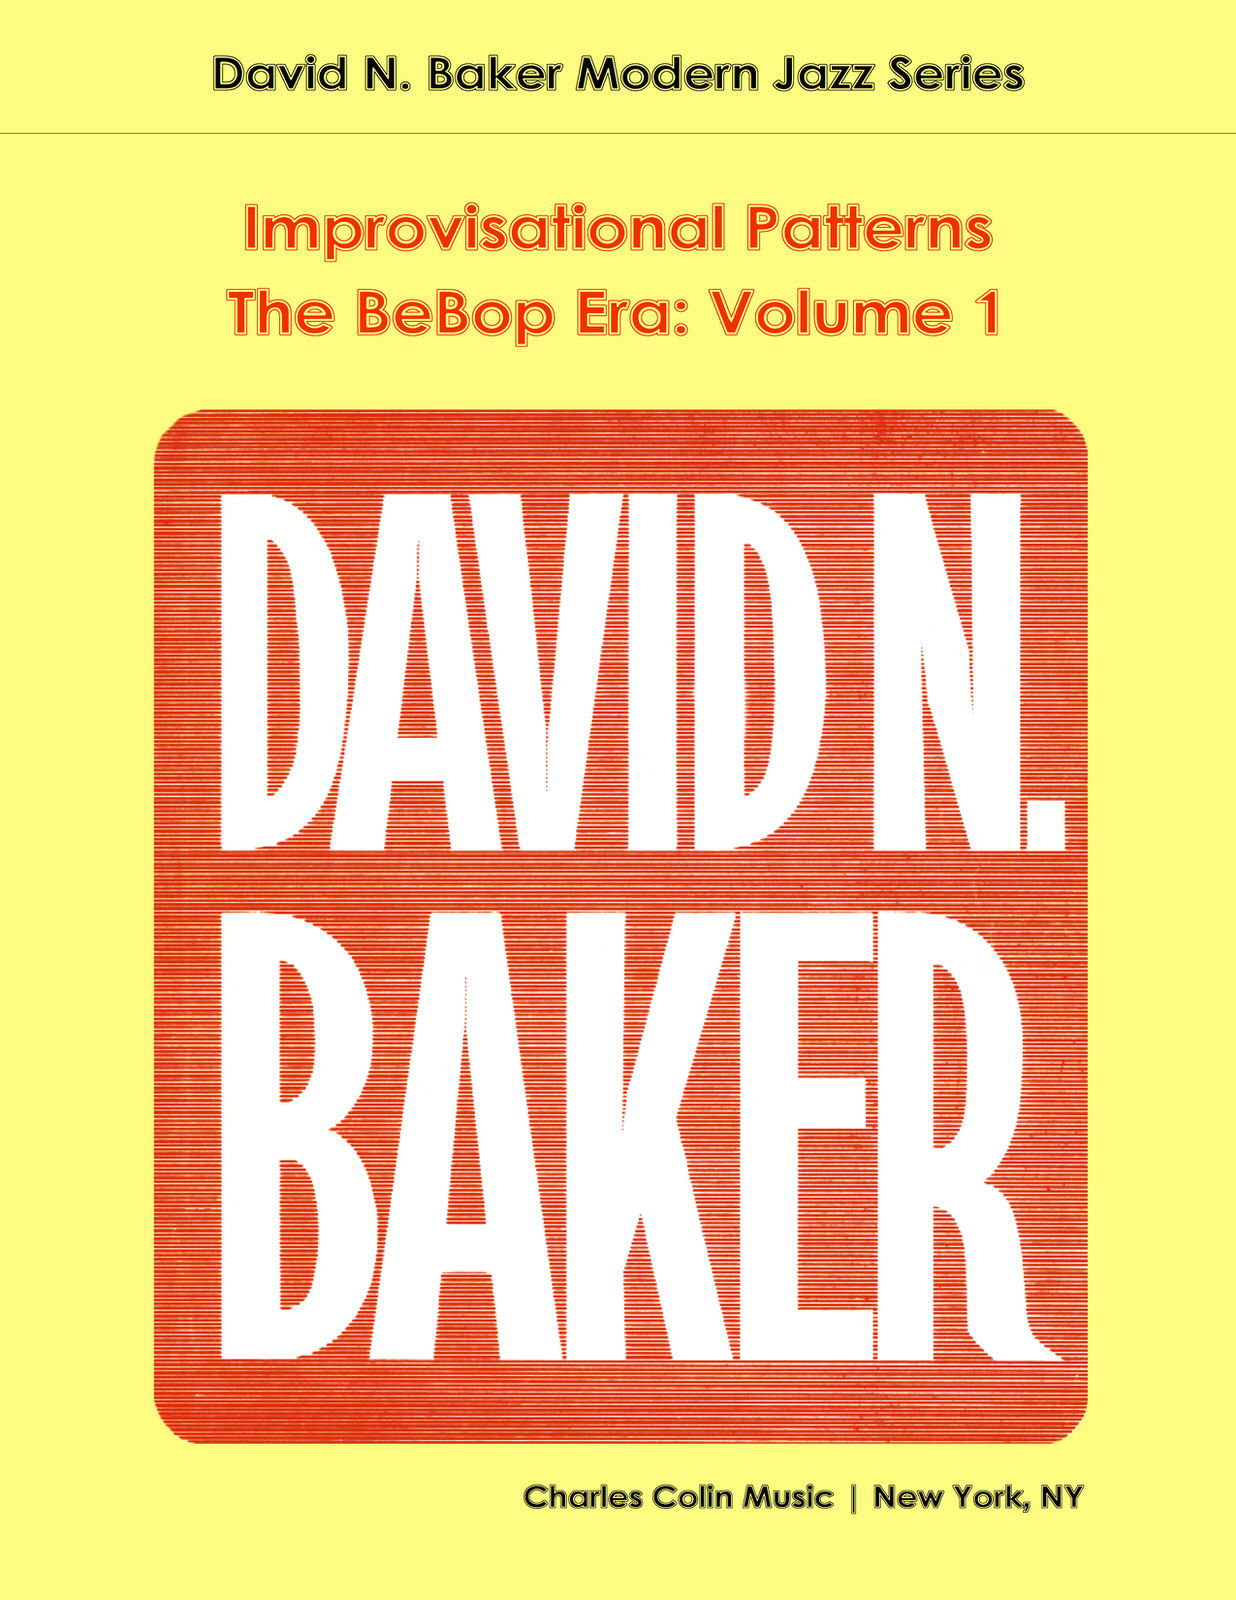 how to play bebop david baker pdf